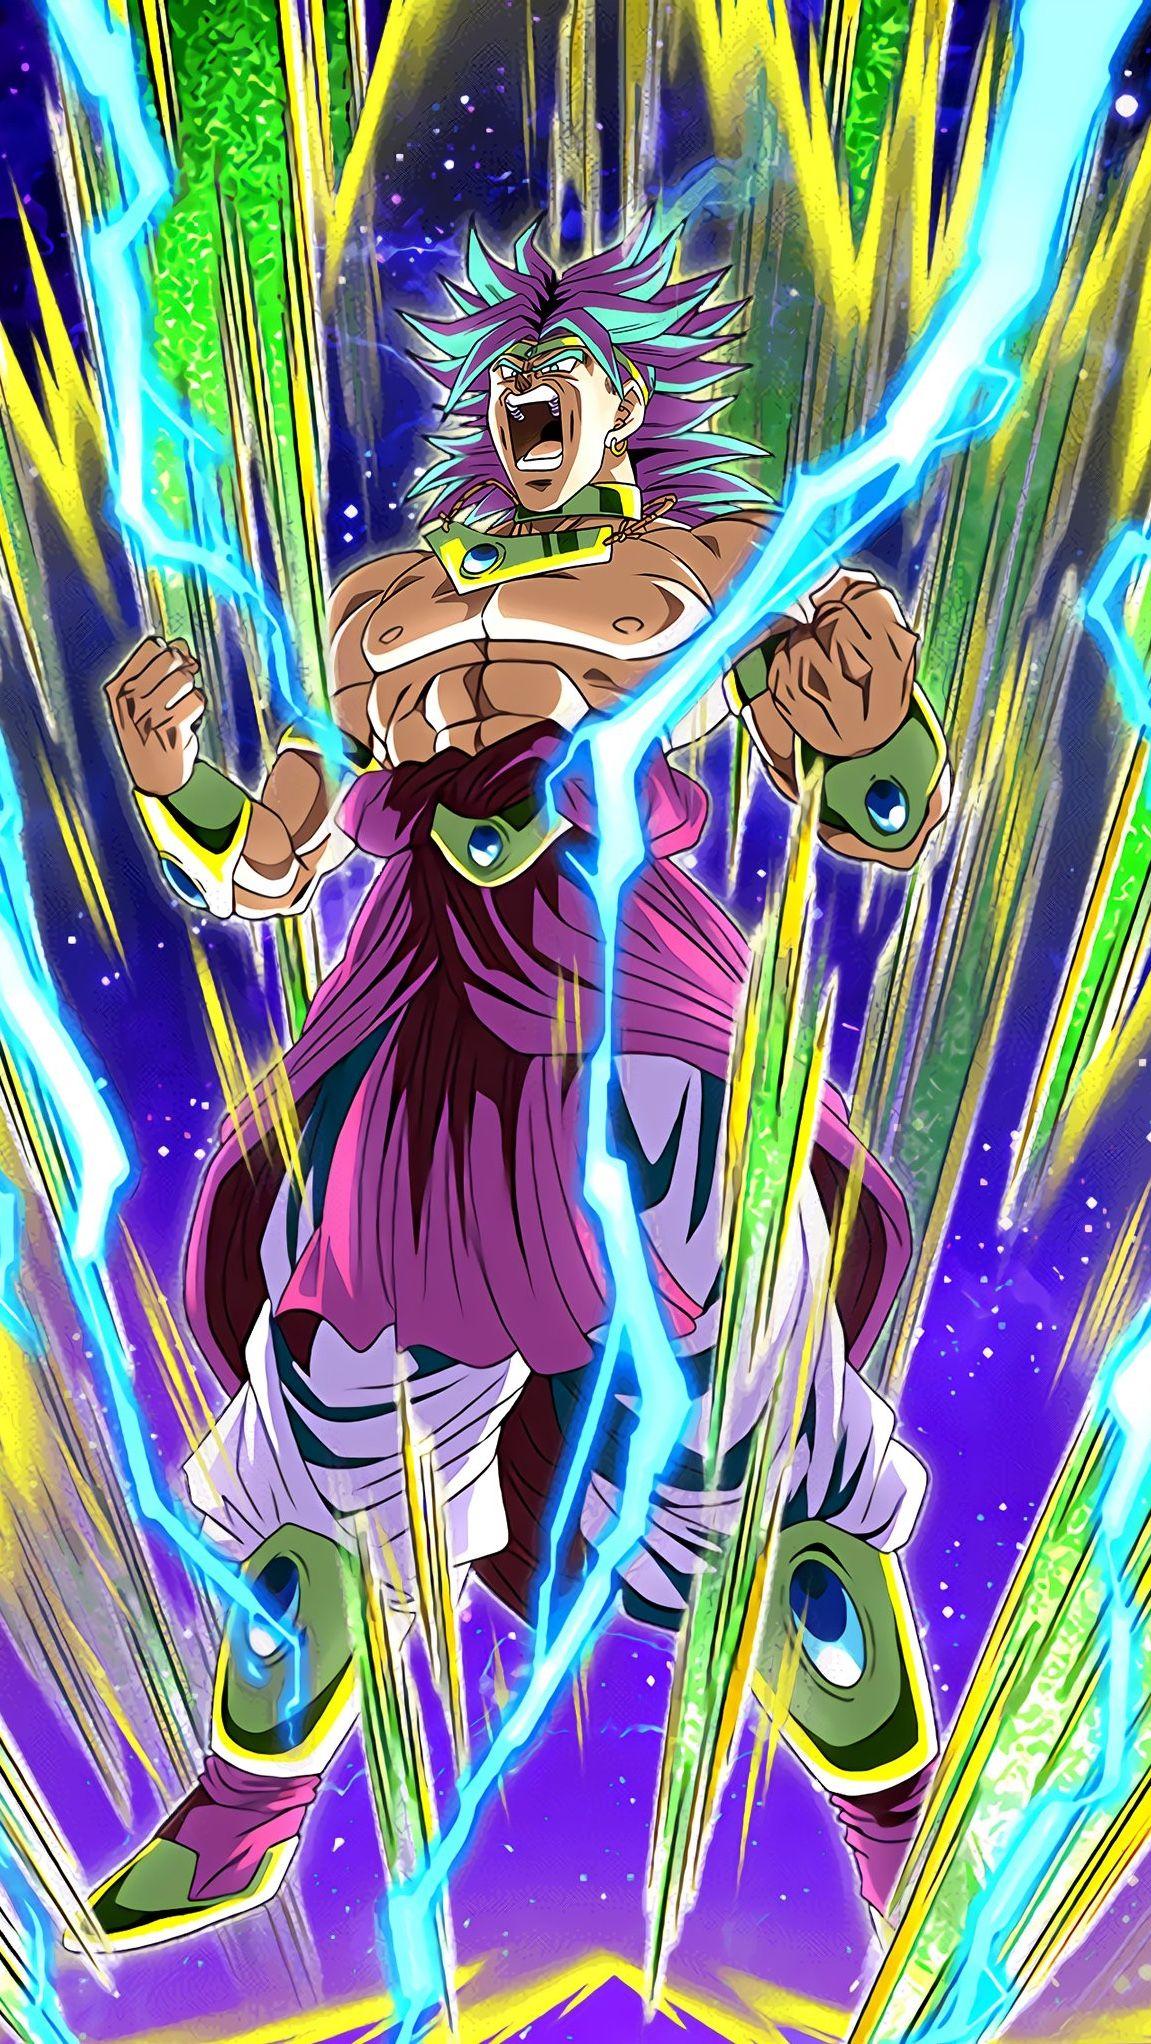 Dokkan Fest Broly Hd In 2021 Dragon Ball Super Artwork Dragon Ball Super Manga Dragon Ball Art